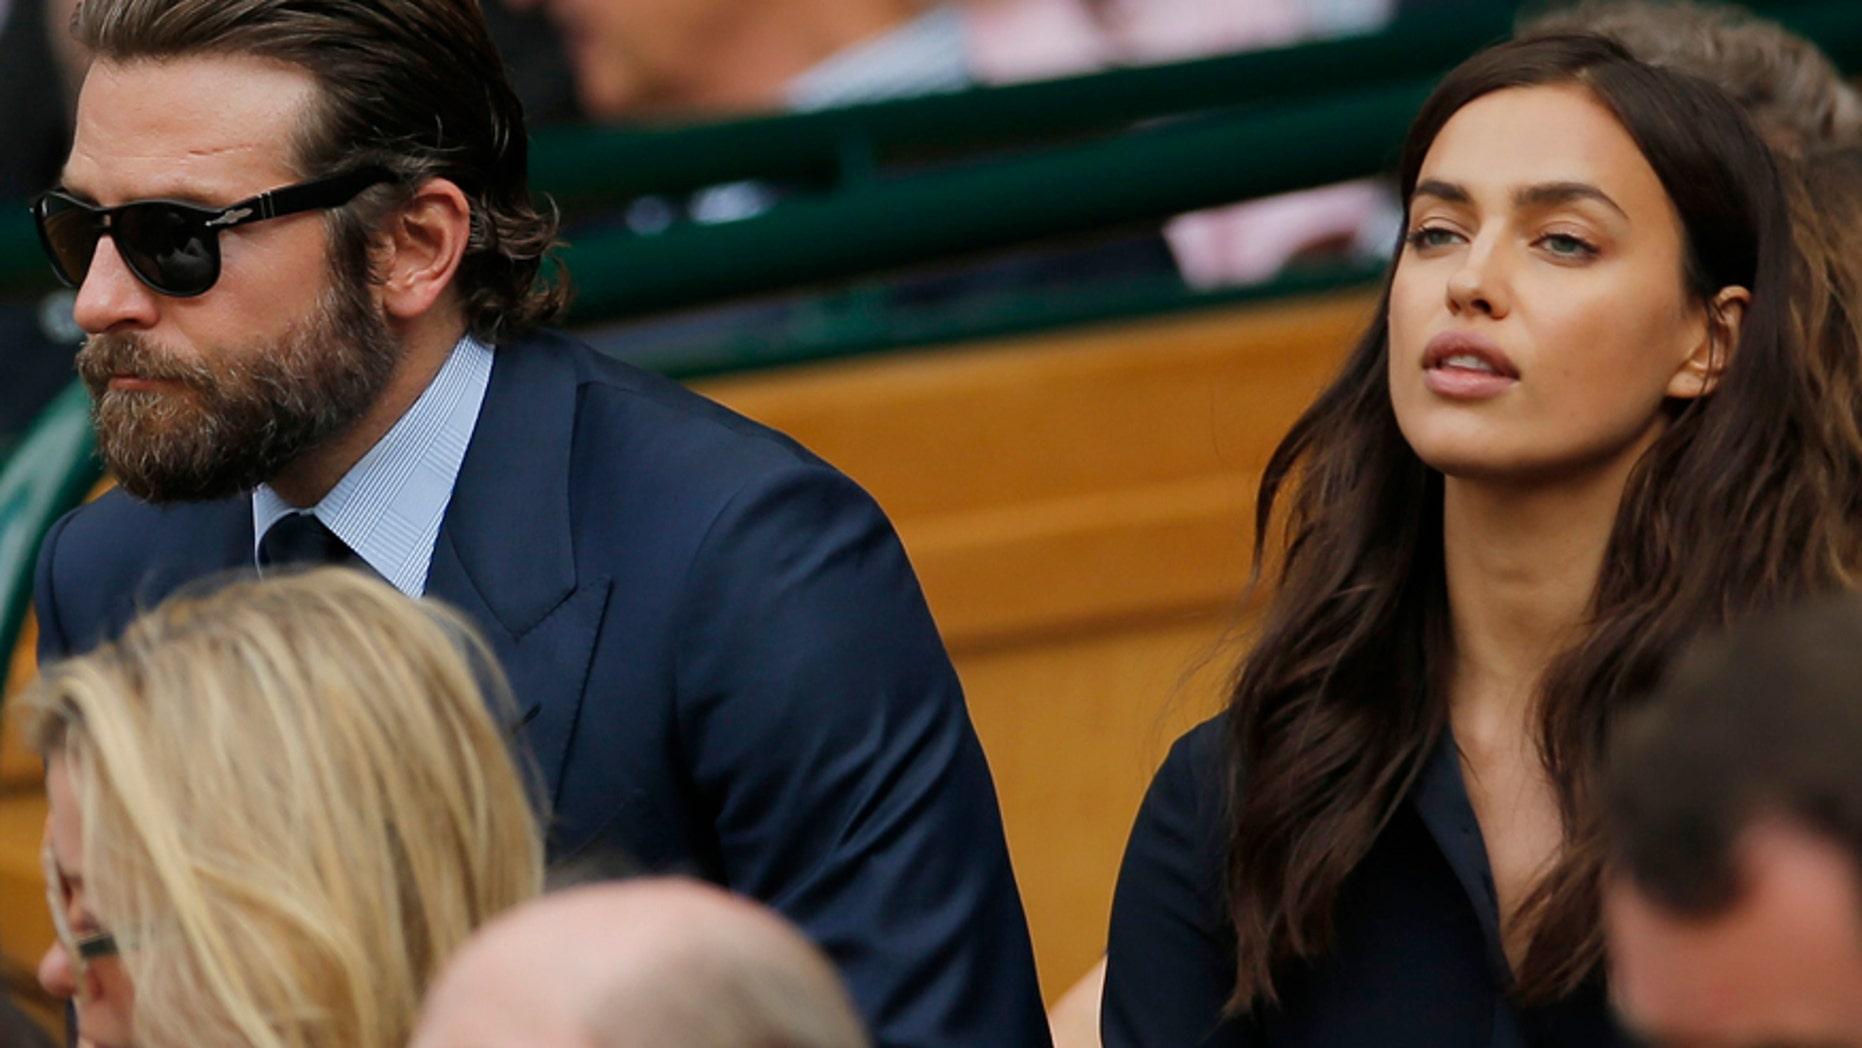 Britain Tennis - Wimbledon - All England Lawn Tennis & Croquet Club, Wimbledon, England - 10/7/16 Actor Bradley Cooper and his girlfriend model Irina Shayk in the royal box on centre court.